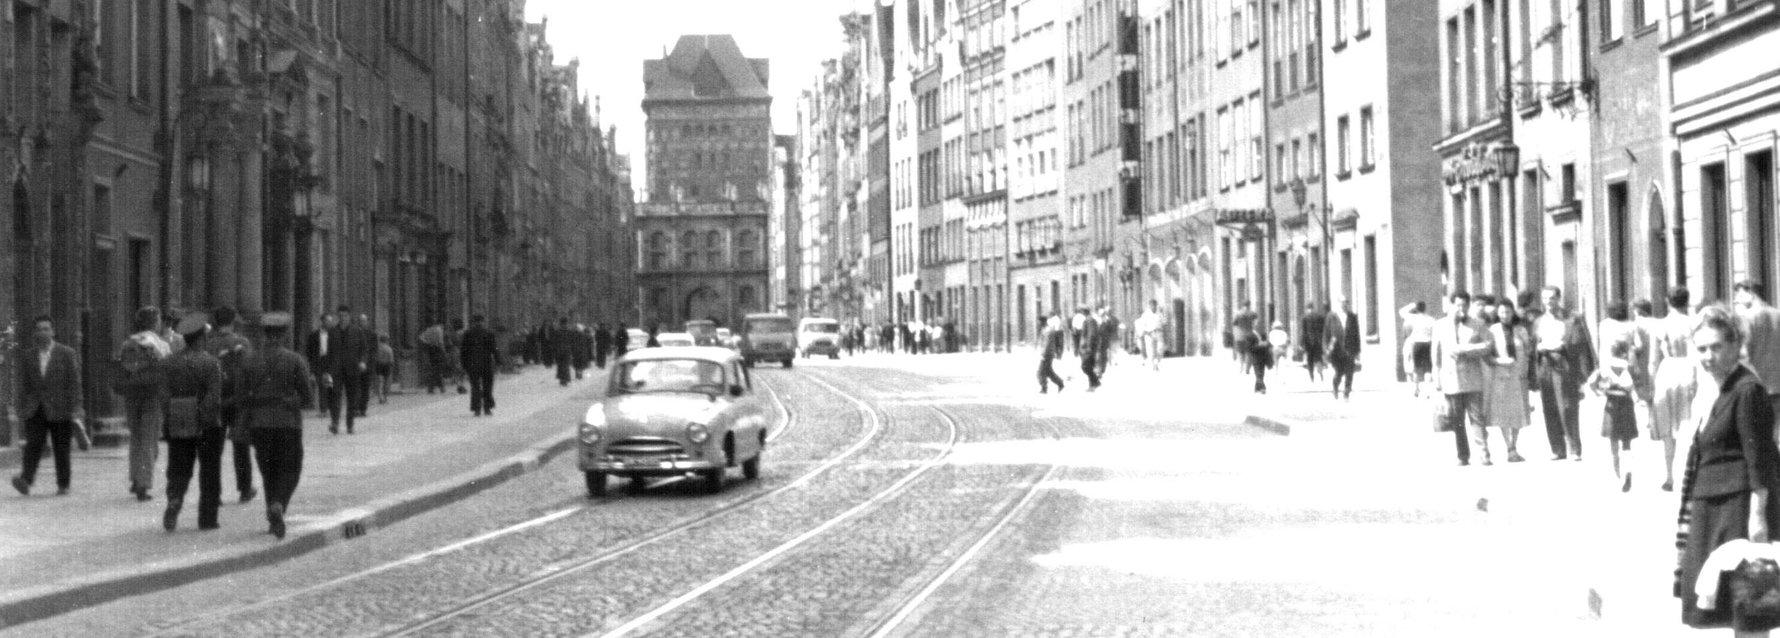 Gdańsk - 1960 Photo by Dr. Elekes Andor, Metapolisz Images